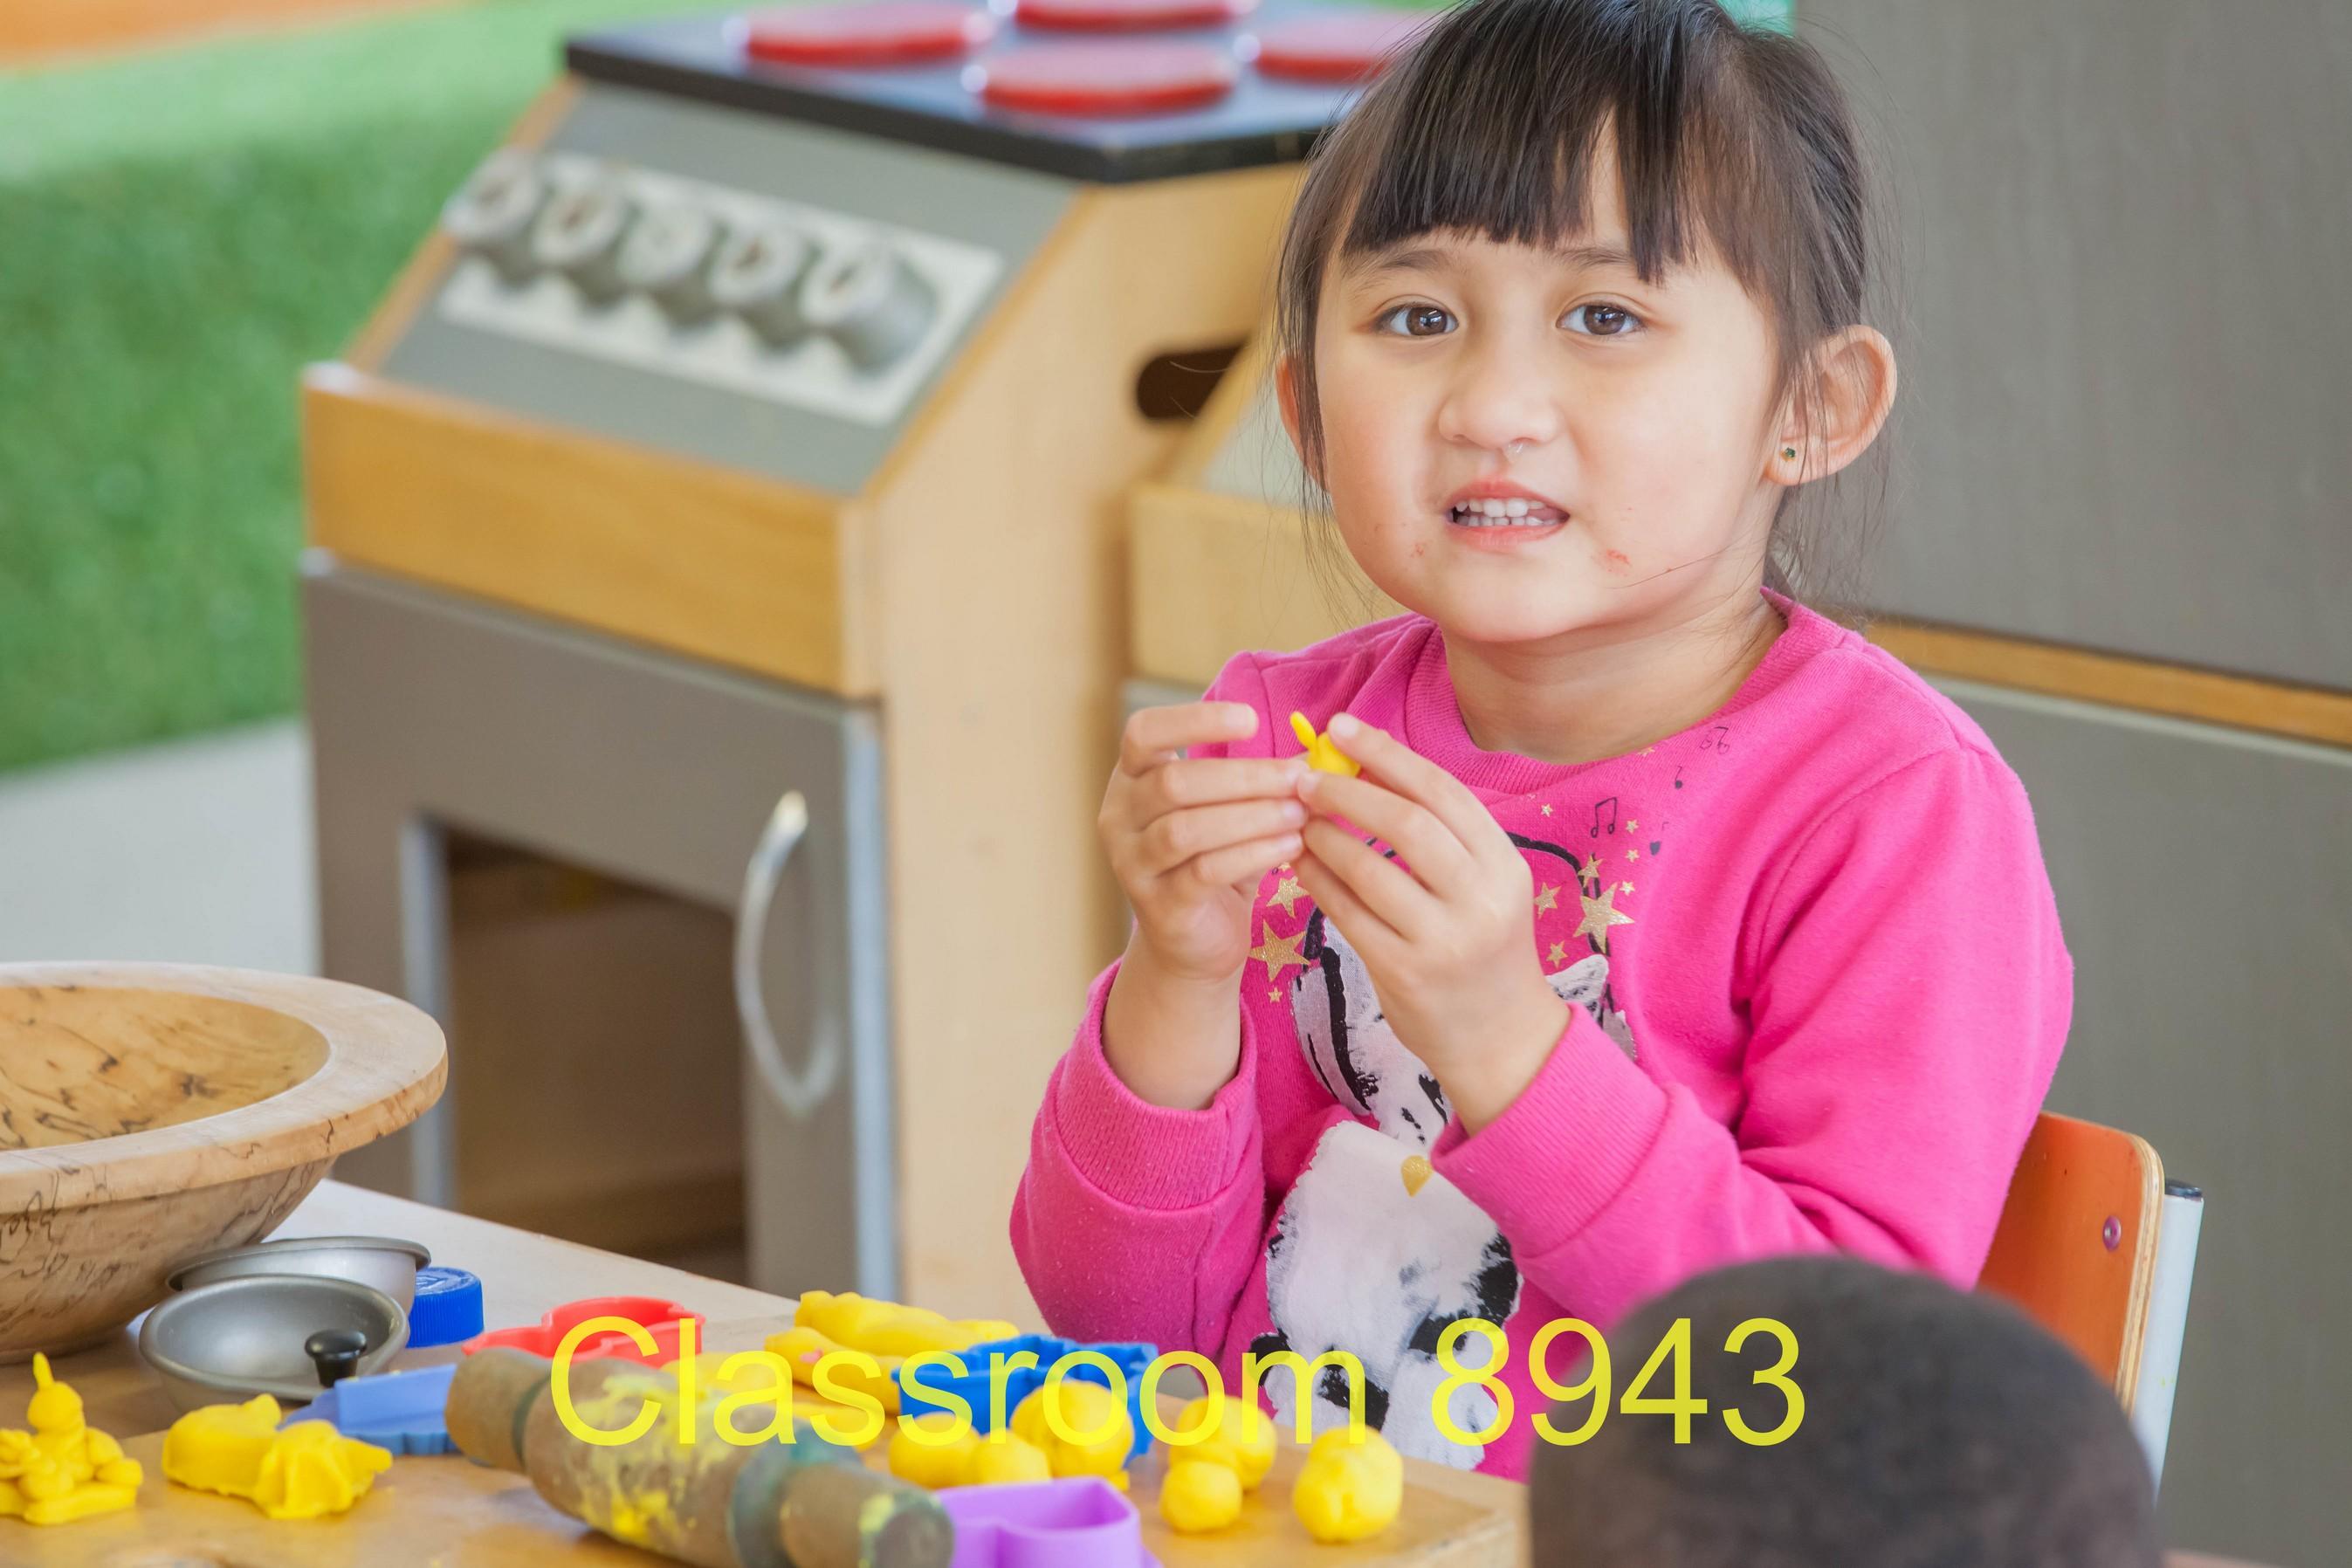 Classroom 8943